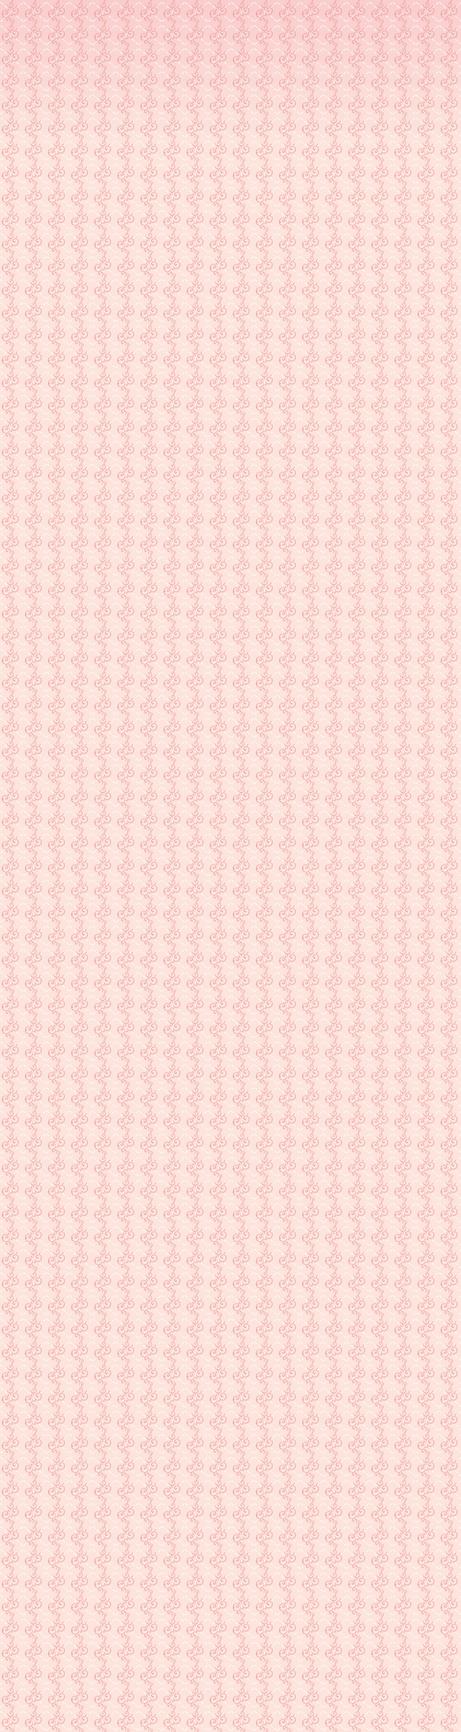 Custom Background 6 by mylastel